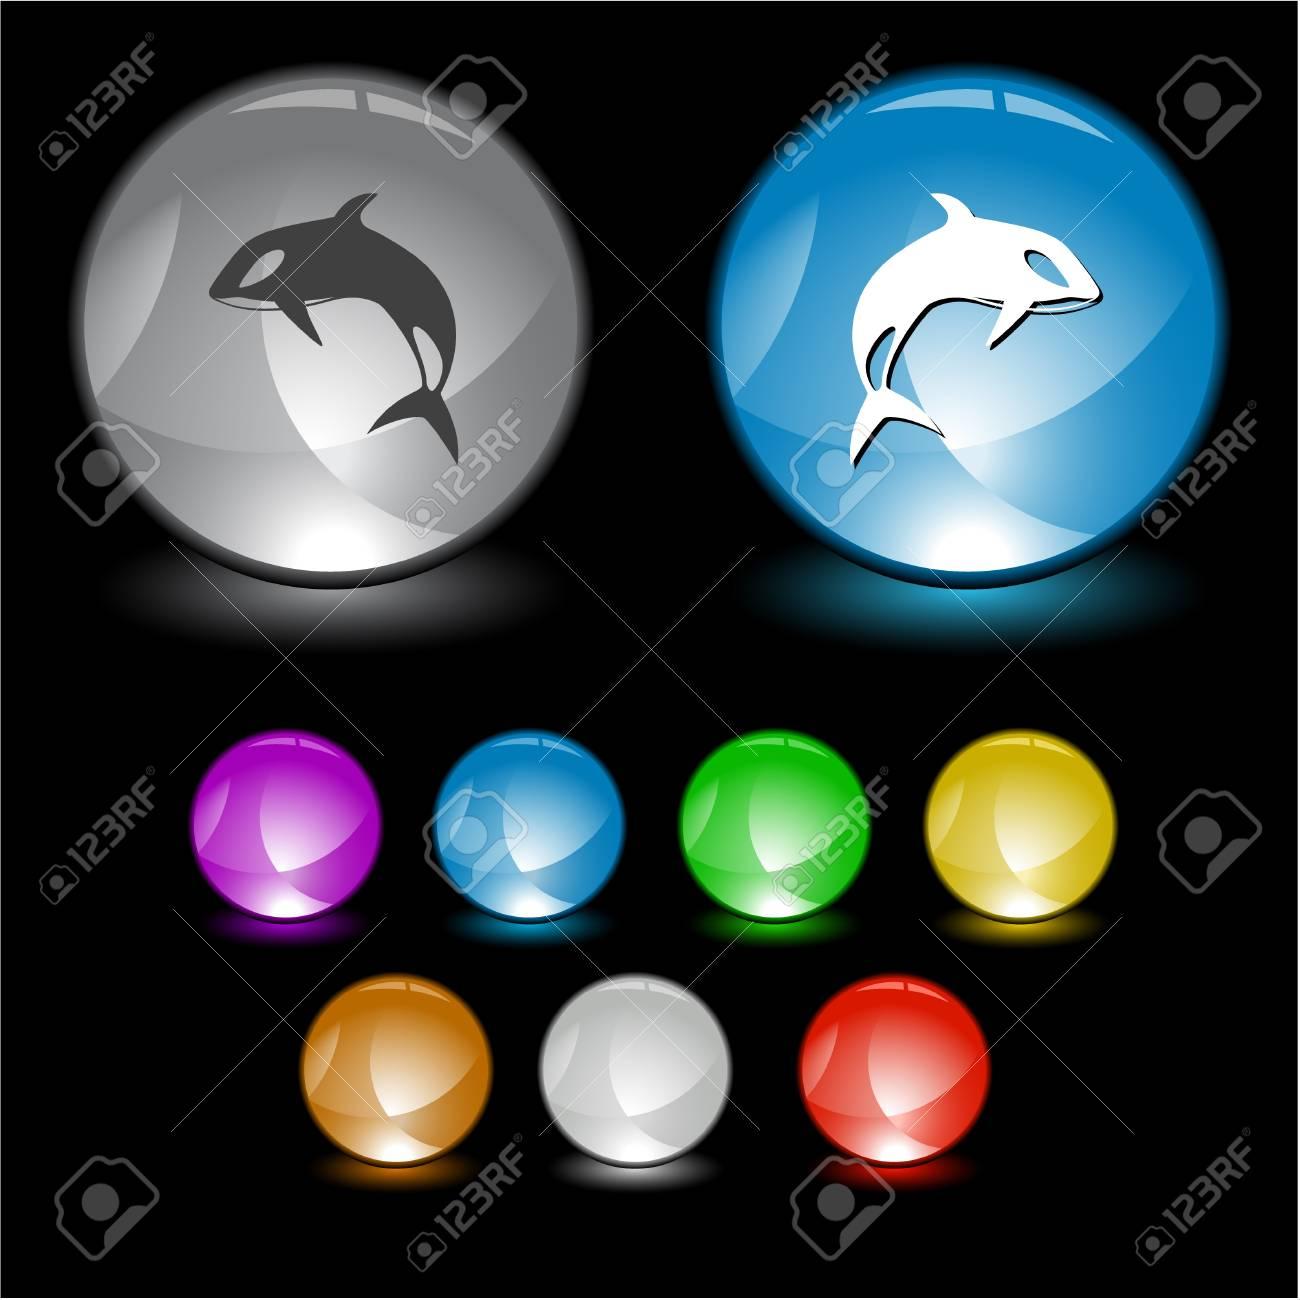 Killer whale. interface element. Stock Photo - 8737902